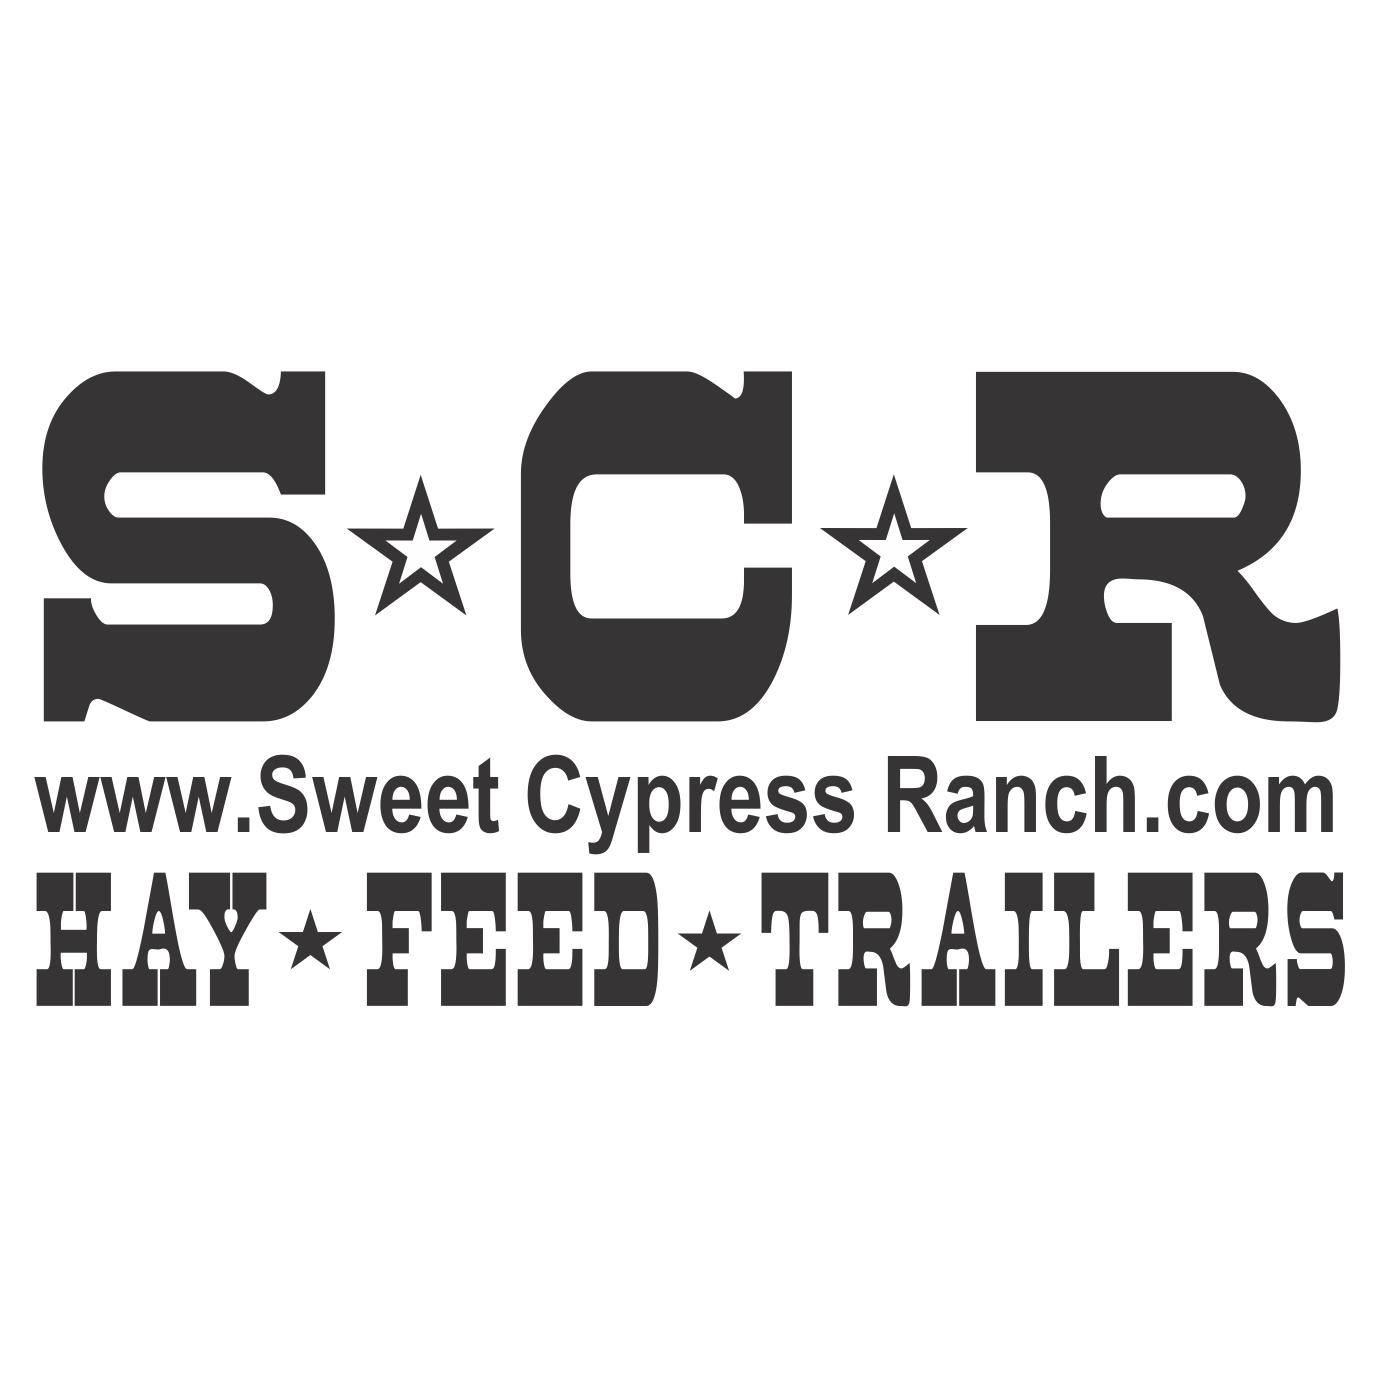 Sweet Cypress Ranch